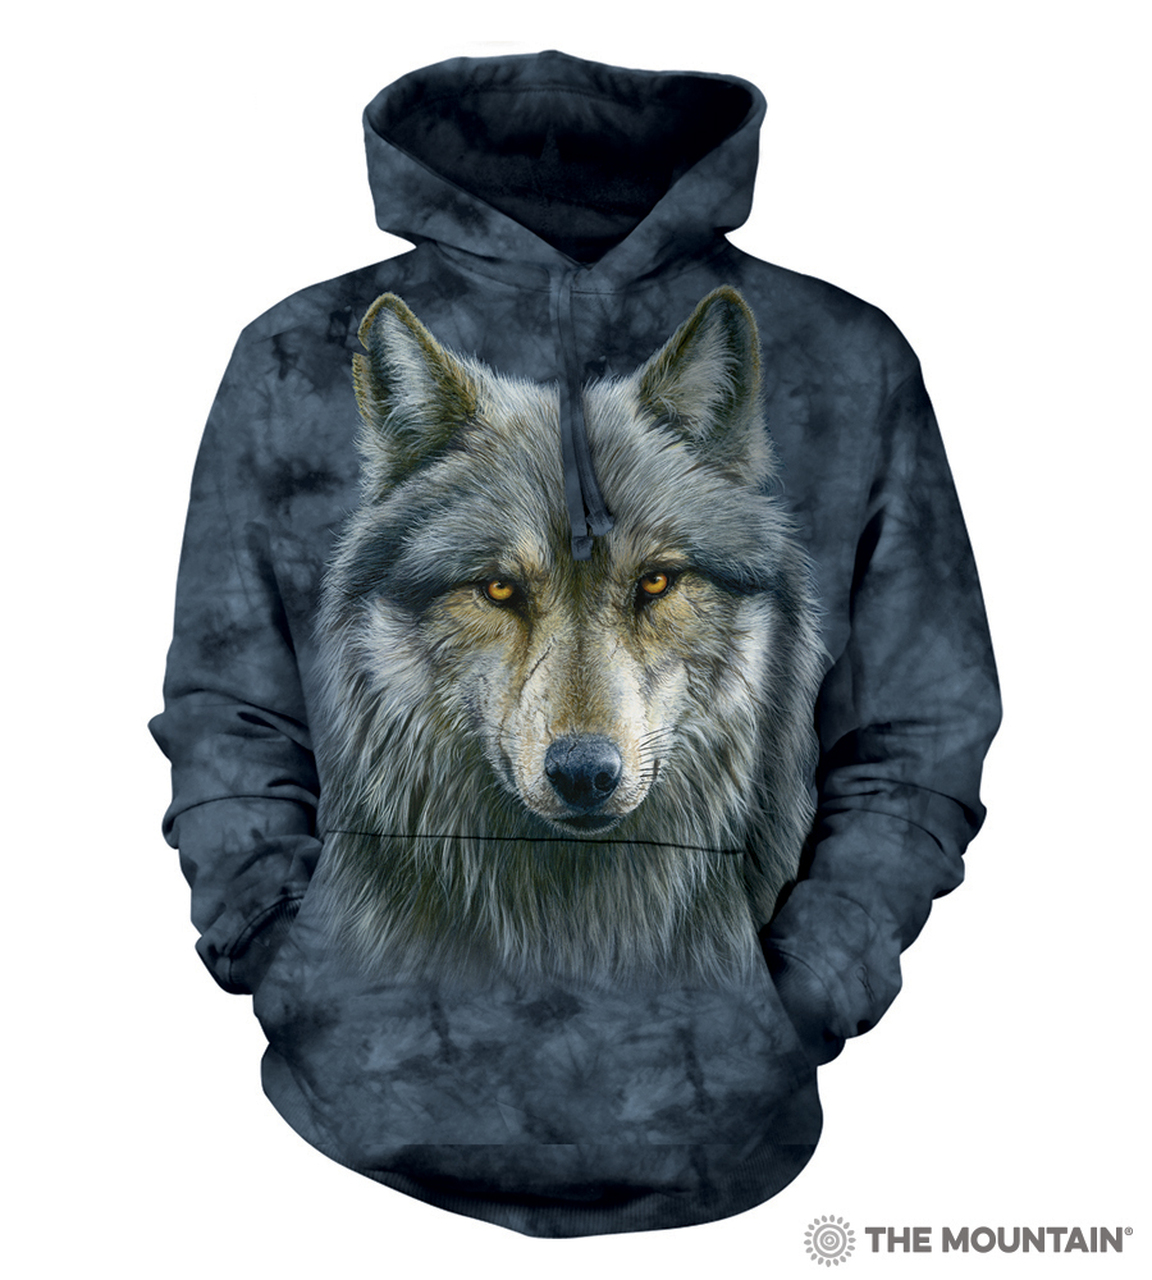 The Mountain Adult Unisex Hoodie Sweatshirt - Warrior Wolf